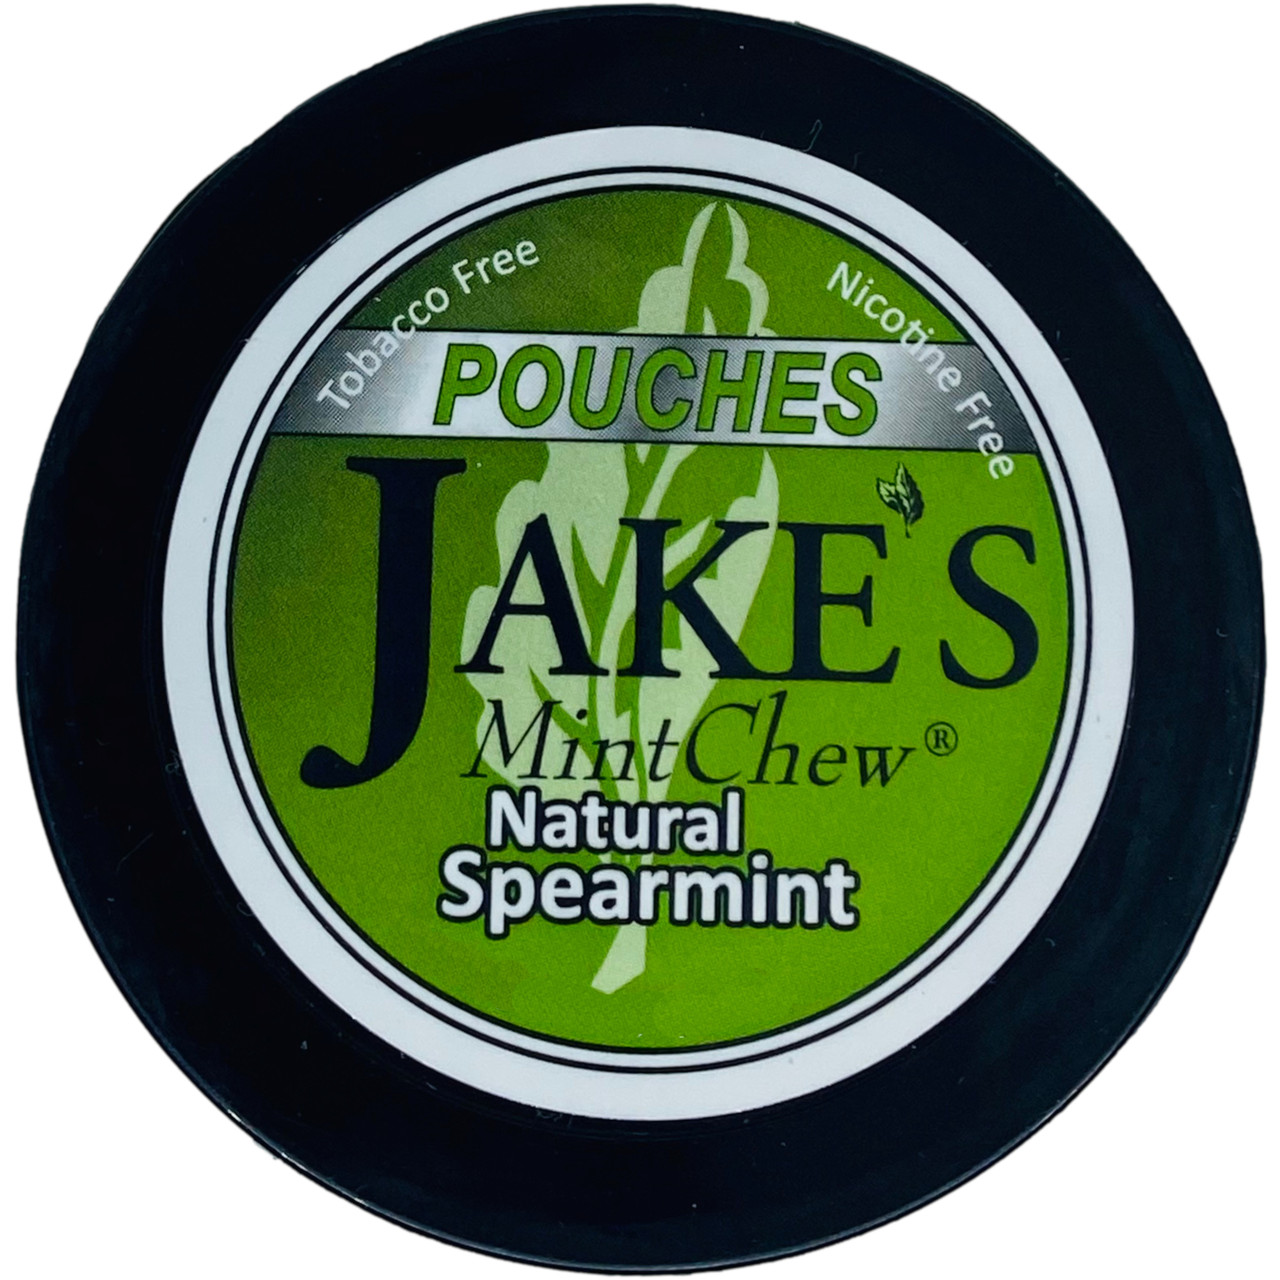 Jake's Mint Chew Pouches Spearmint 1 Can